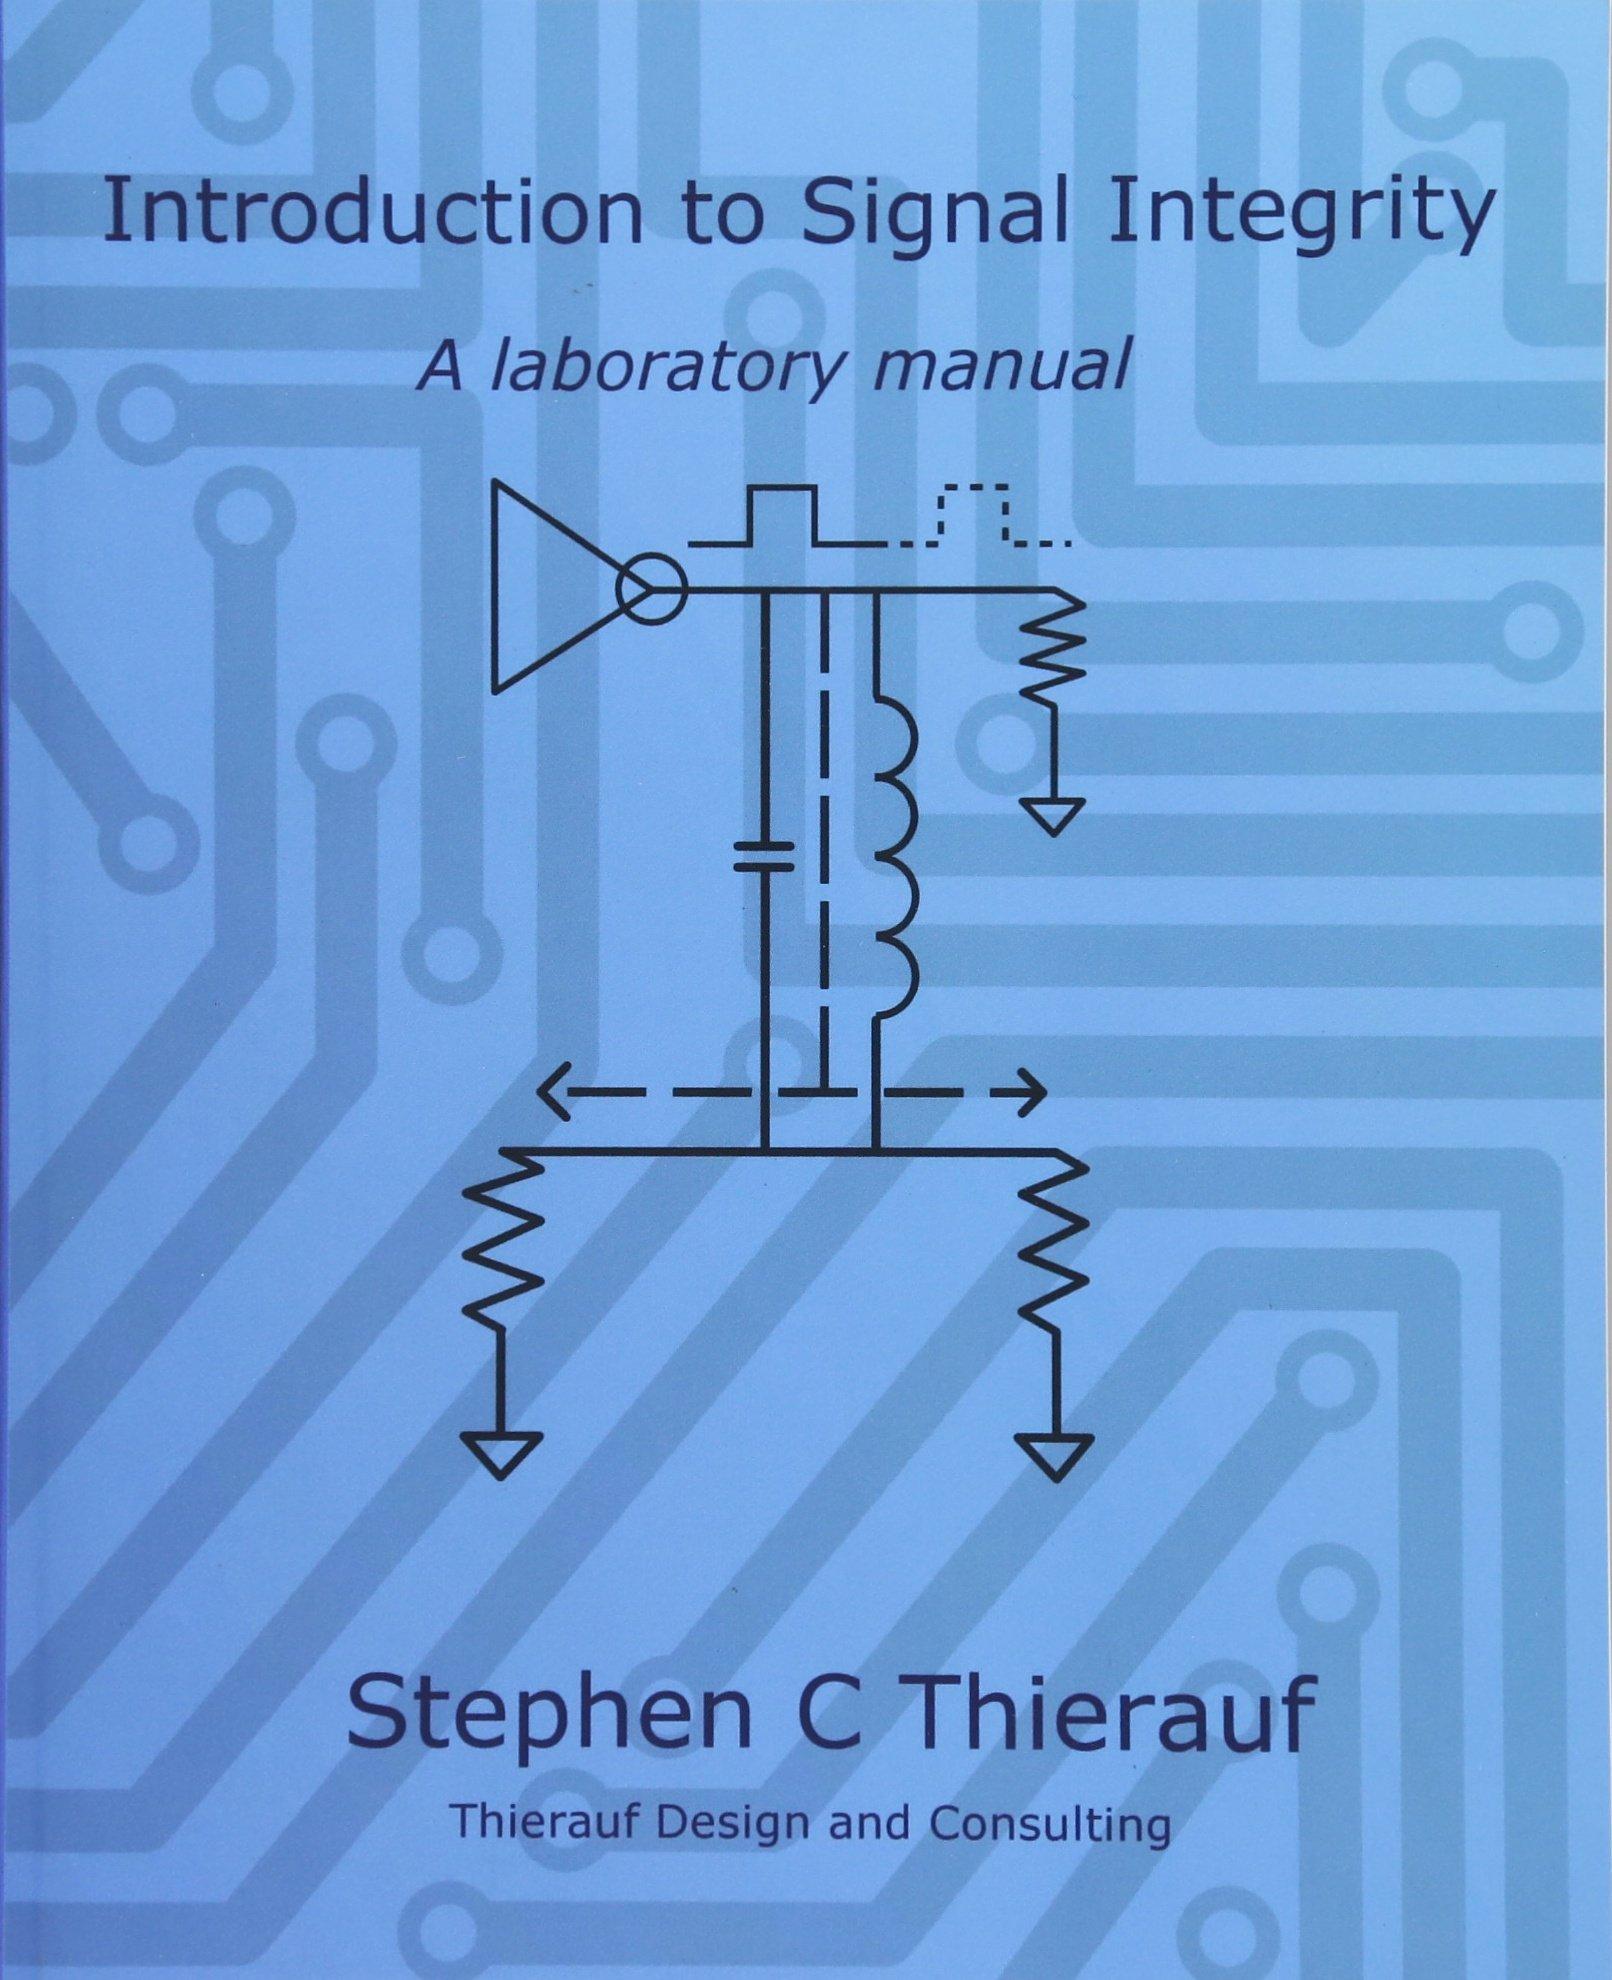 Introduction to Signal Integrity: A Laboratory Manual: Stephen C Thierauf:  9781500480516: Amazon.com: Books